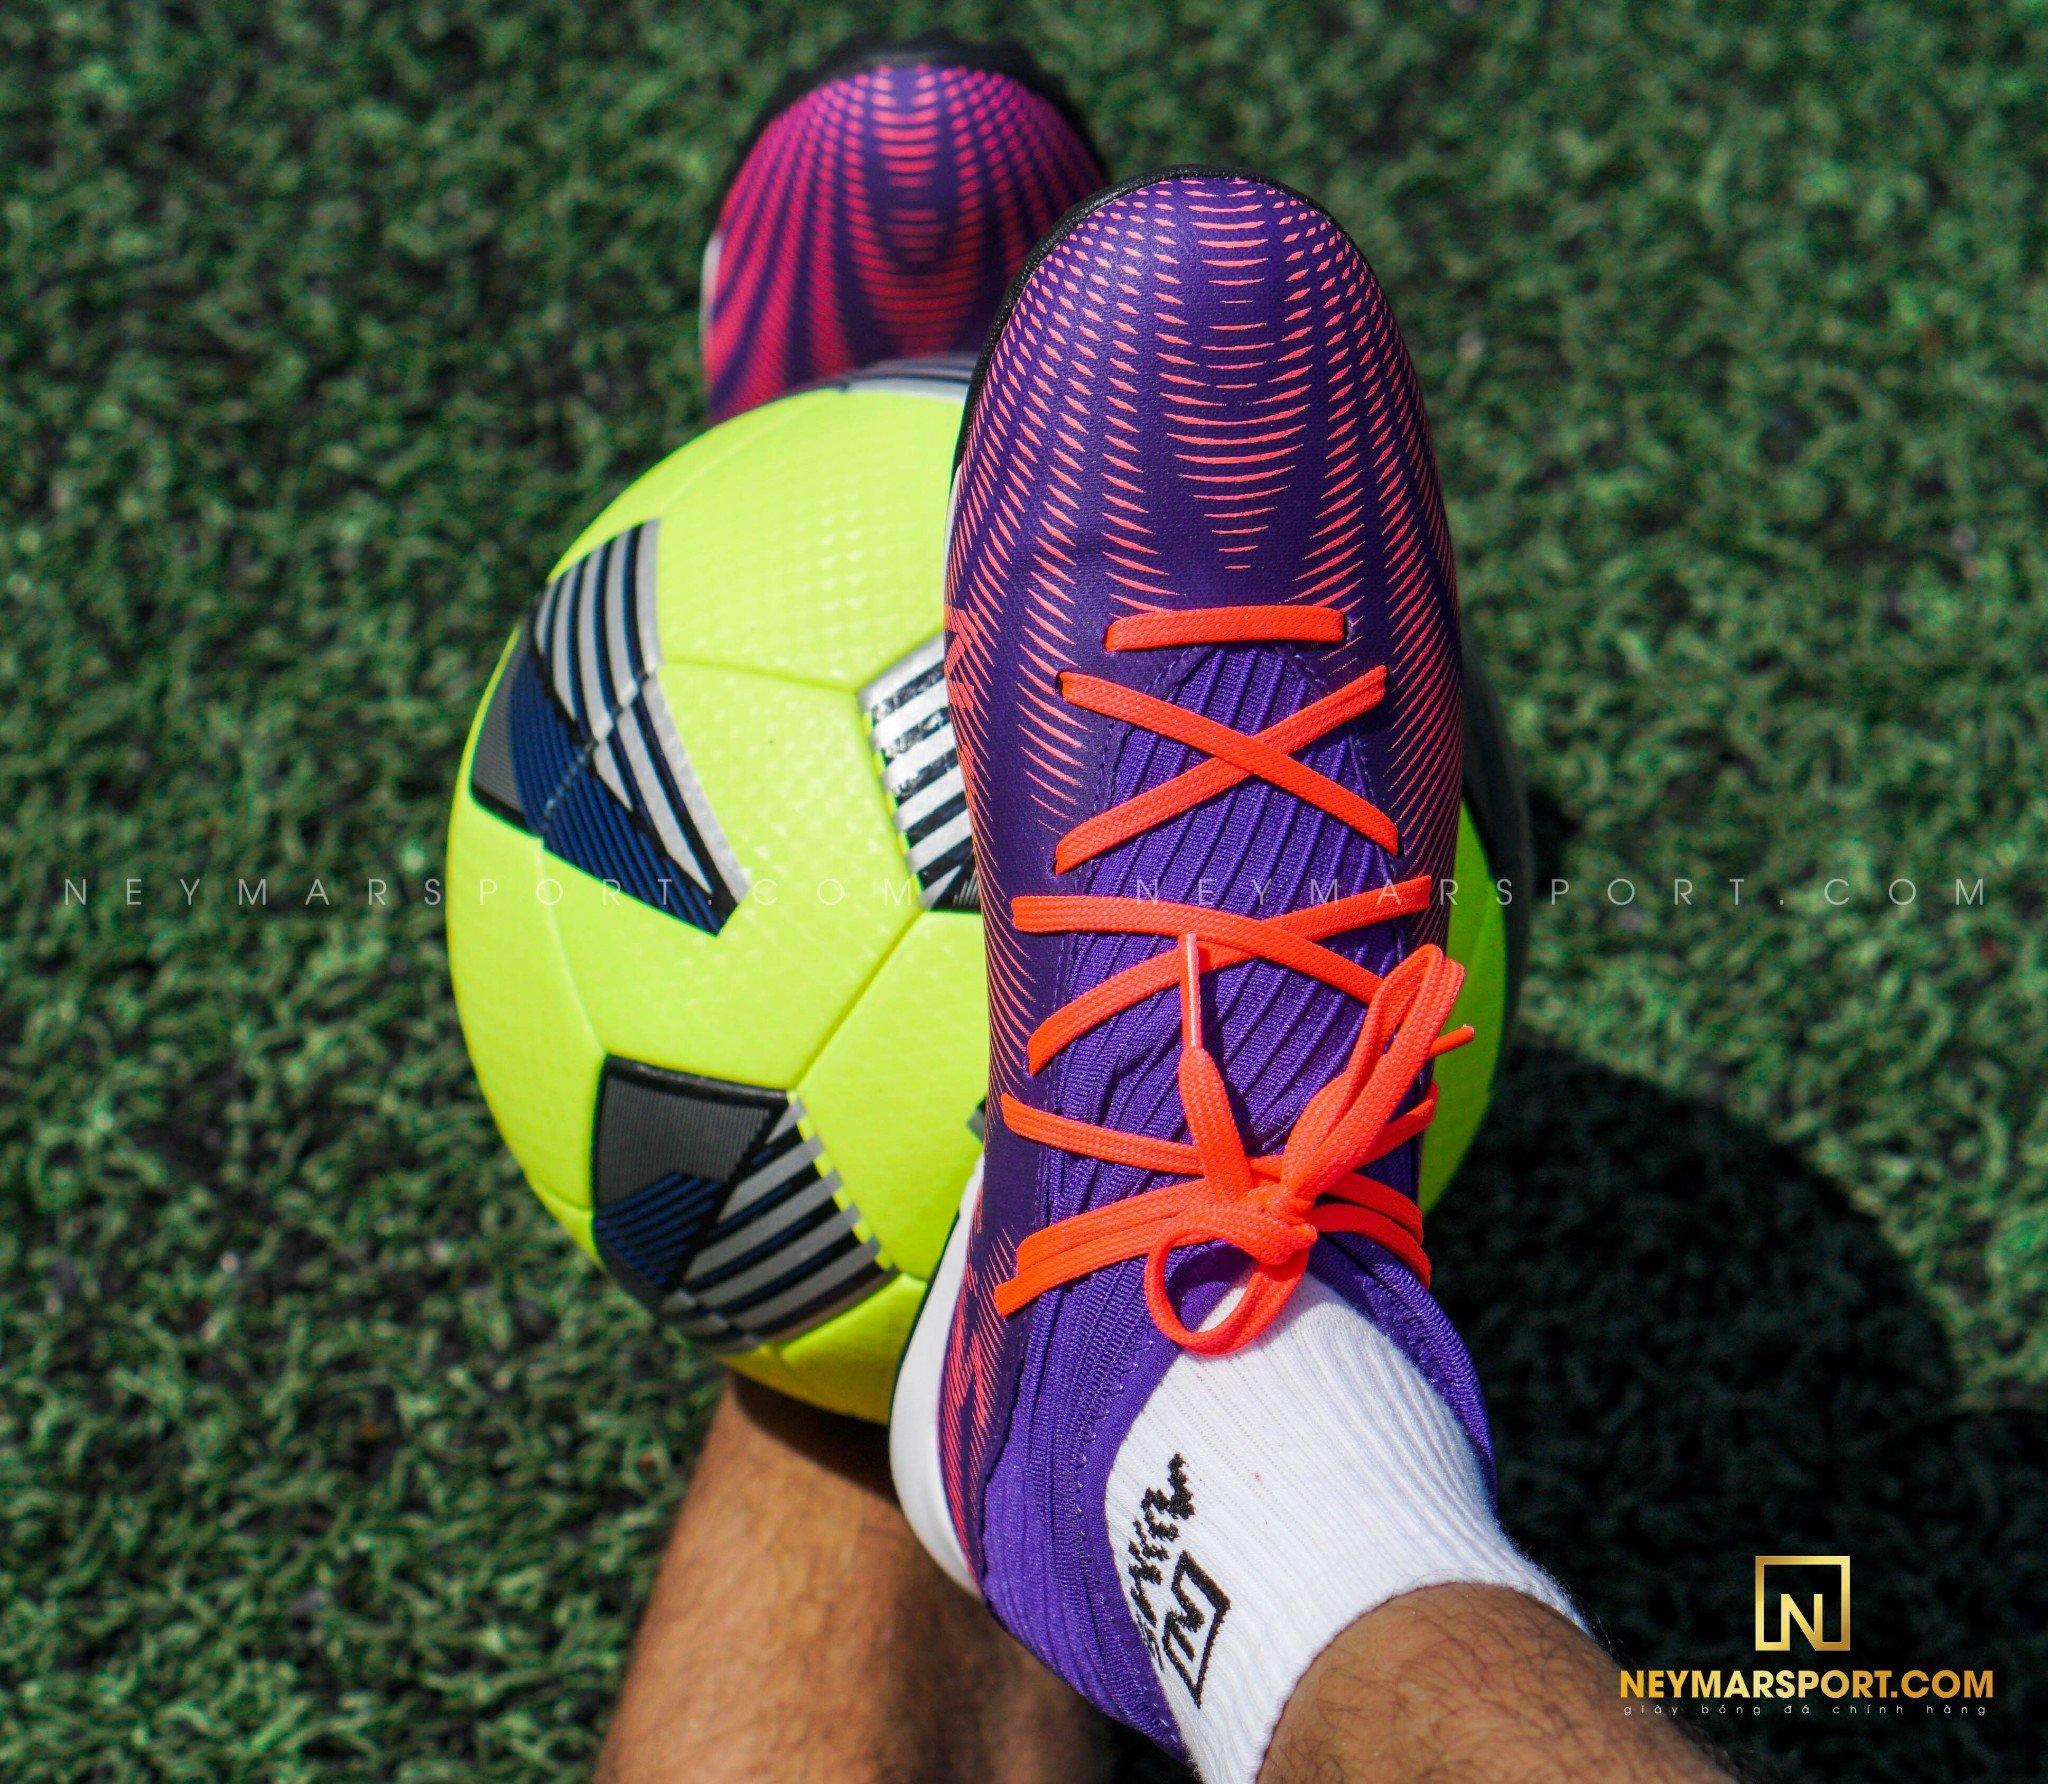 Giày đá bóng adidas Nemeziz Precision to Blur